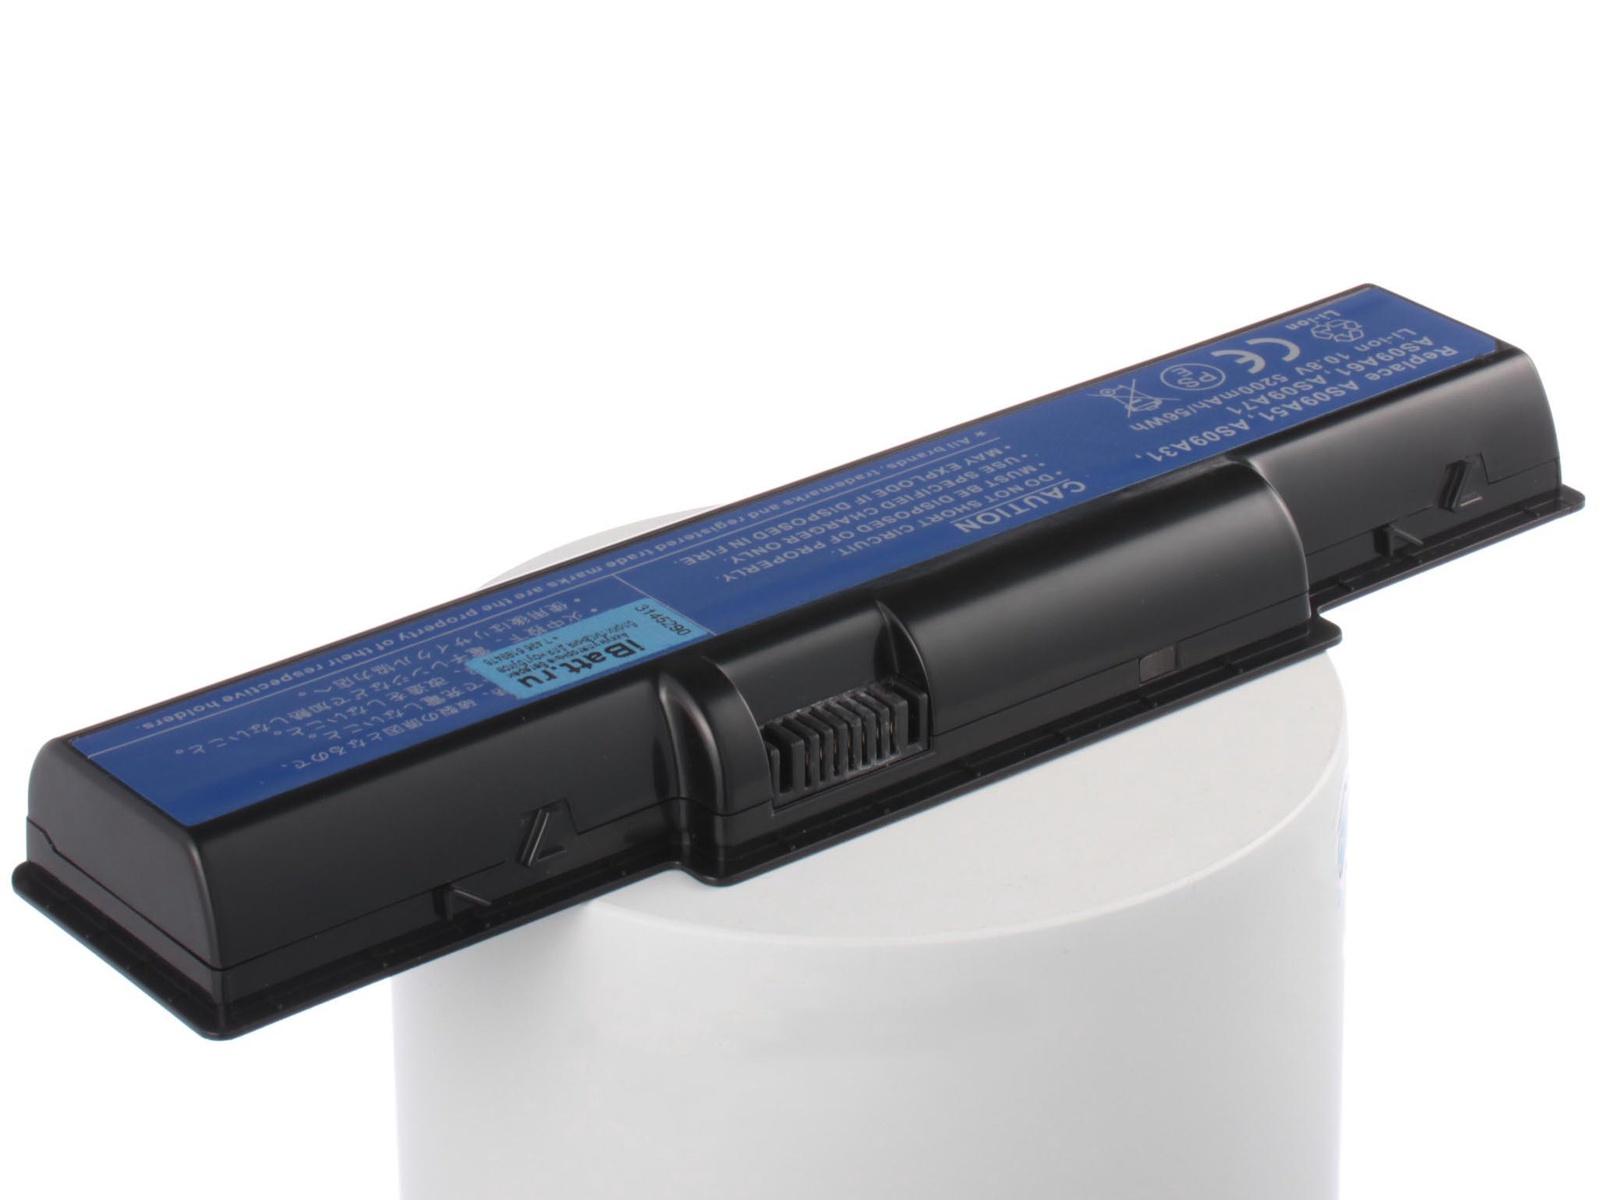 Аккумулятор для ноутбука iBatt для Acer eMachines E525, eMachines E725, Aspire 5732Z, eMachine G525, eMachines G525, Aspire 5541G, Aspire 5541, eMachines E527, Aspire 5732ZG, eMachine G725, eMachines G725, Aspire 5532 монитор emachines e220hqv